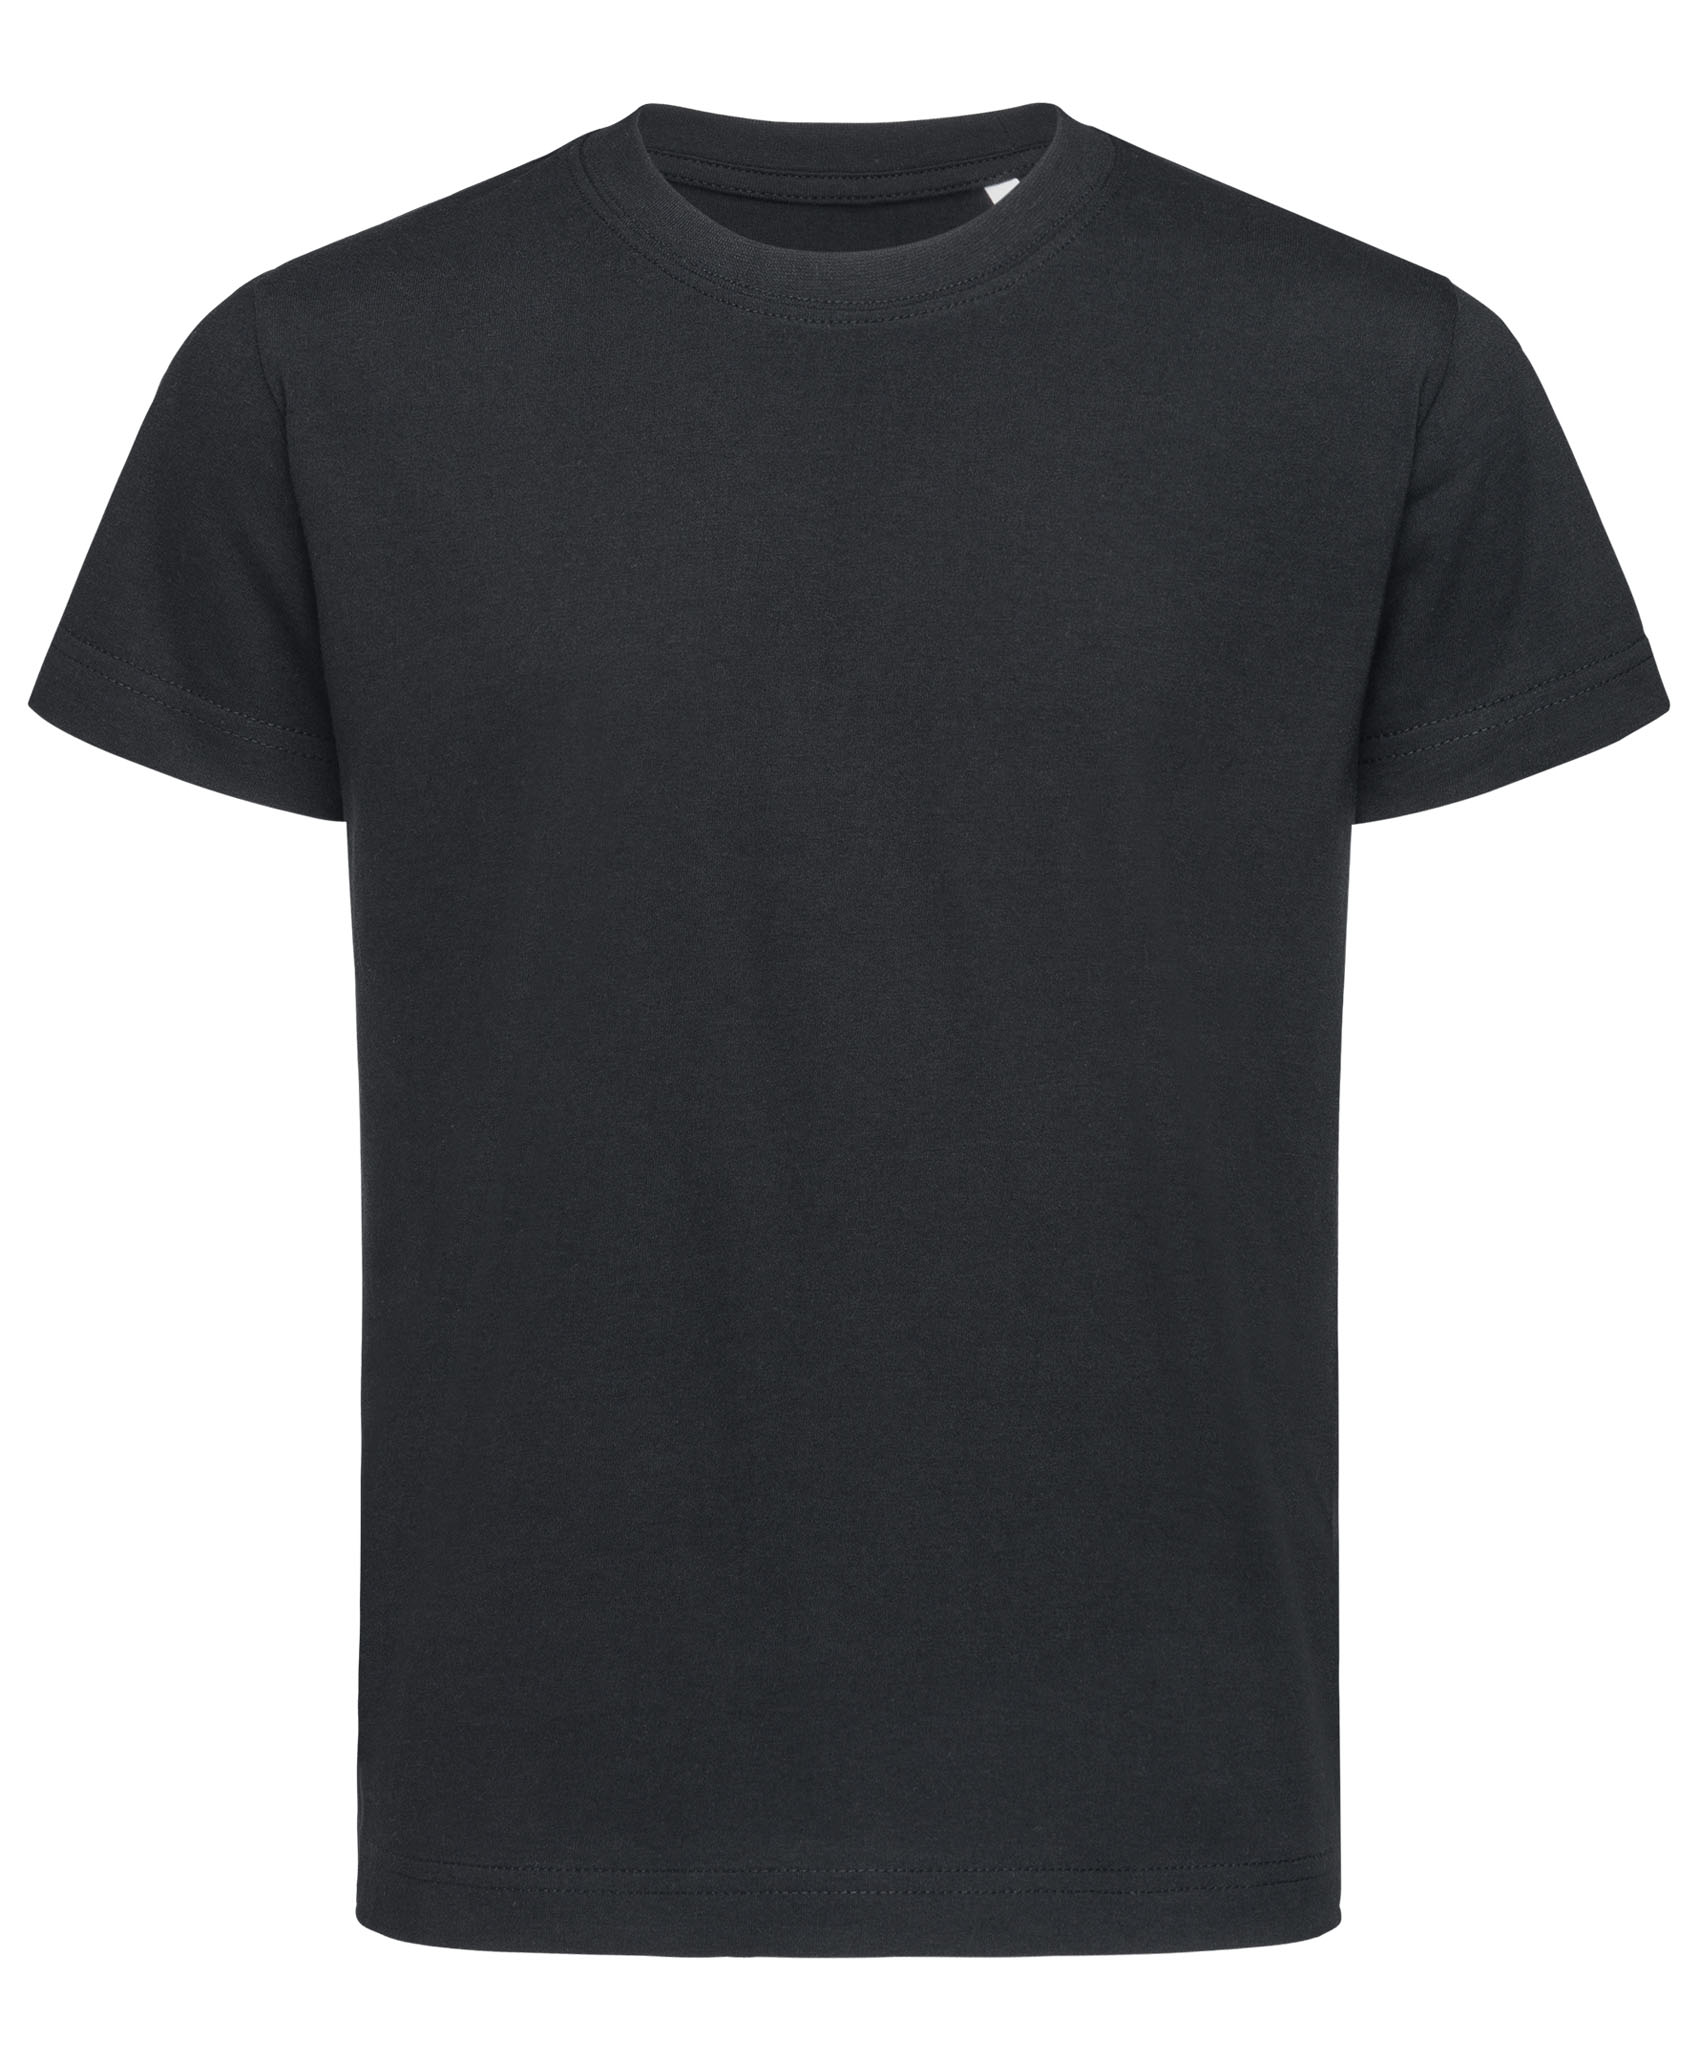 Stedman T-shirt Crewneck Organic Jamie SS for kids